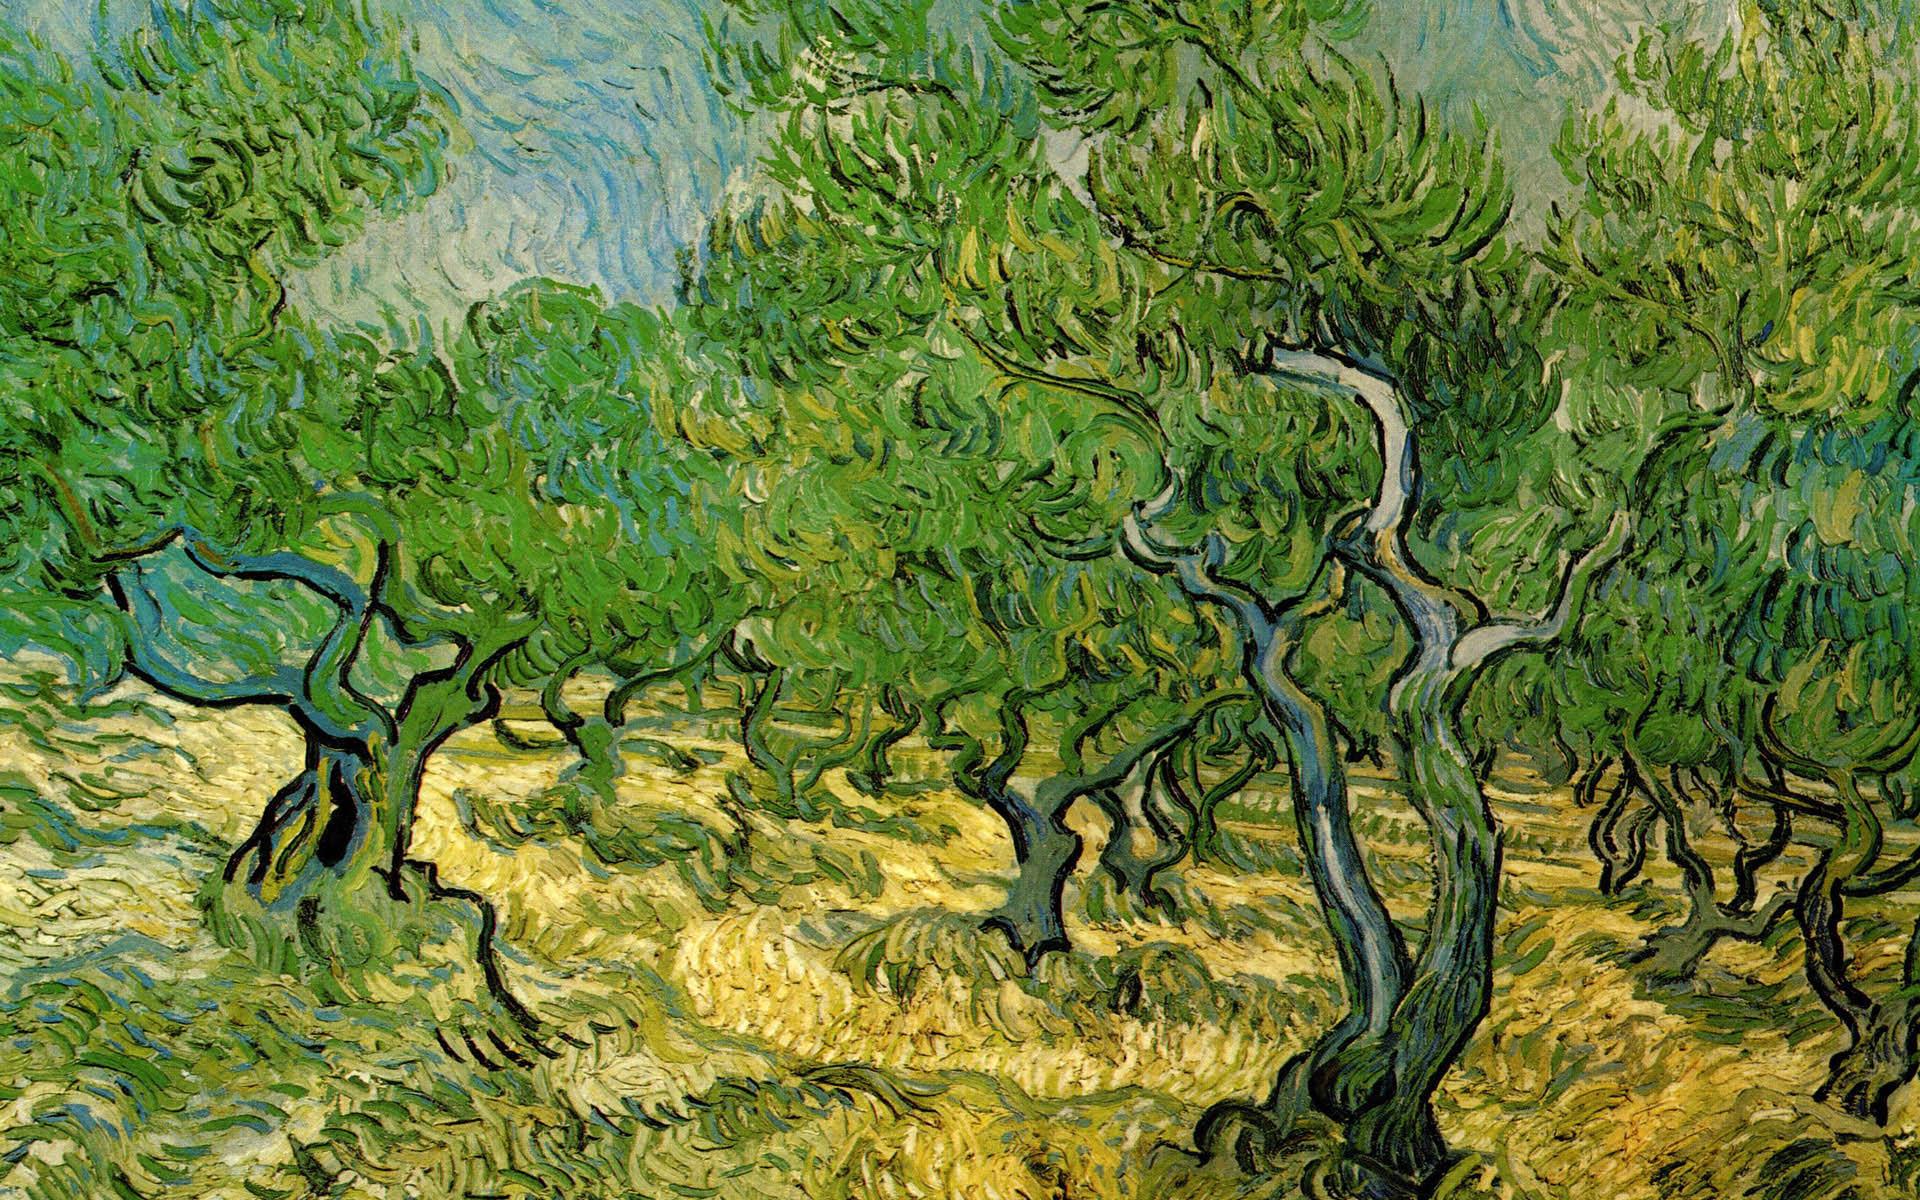 wallpaper_van-gogh_animaatjes-35.jpg (Image JPEG, 1920×1200 pixels) - Redimensionnée (65%)